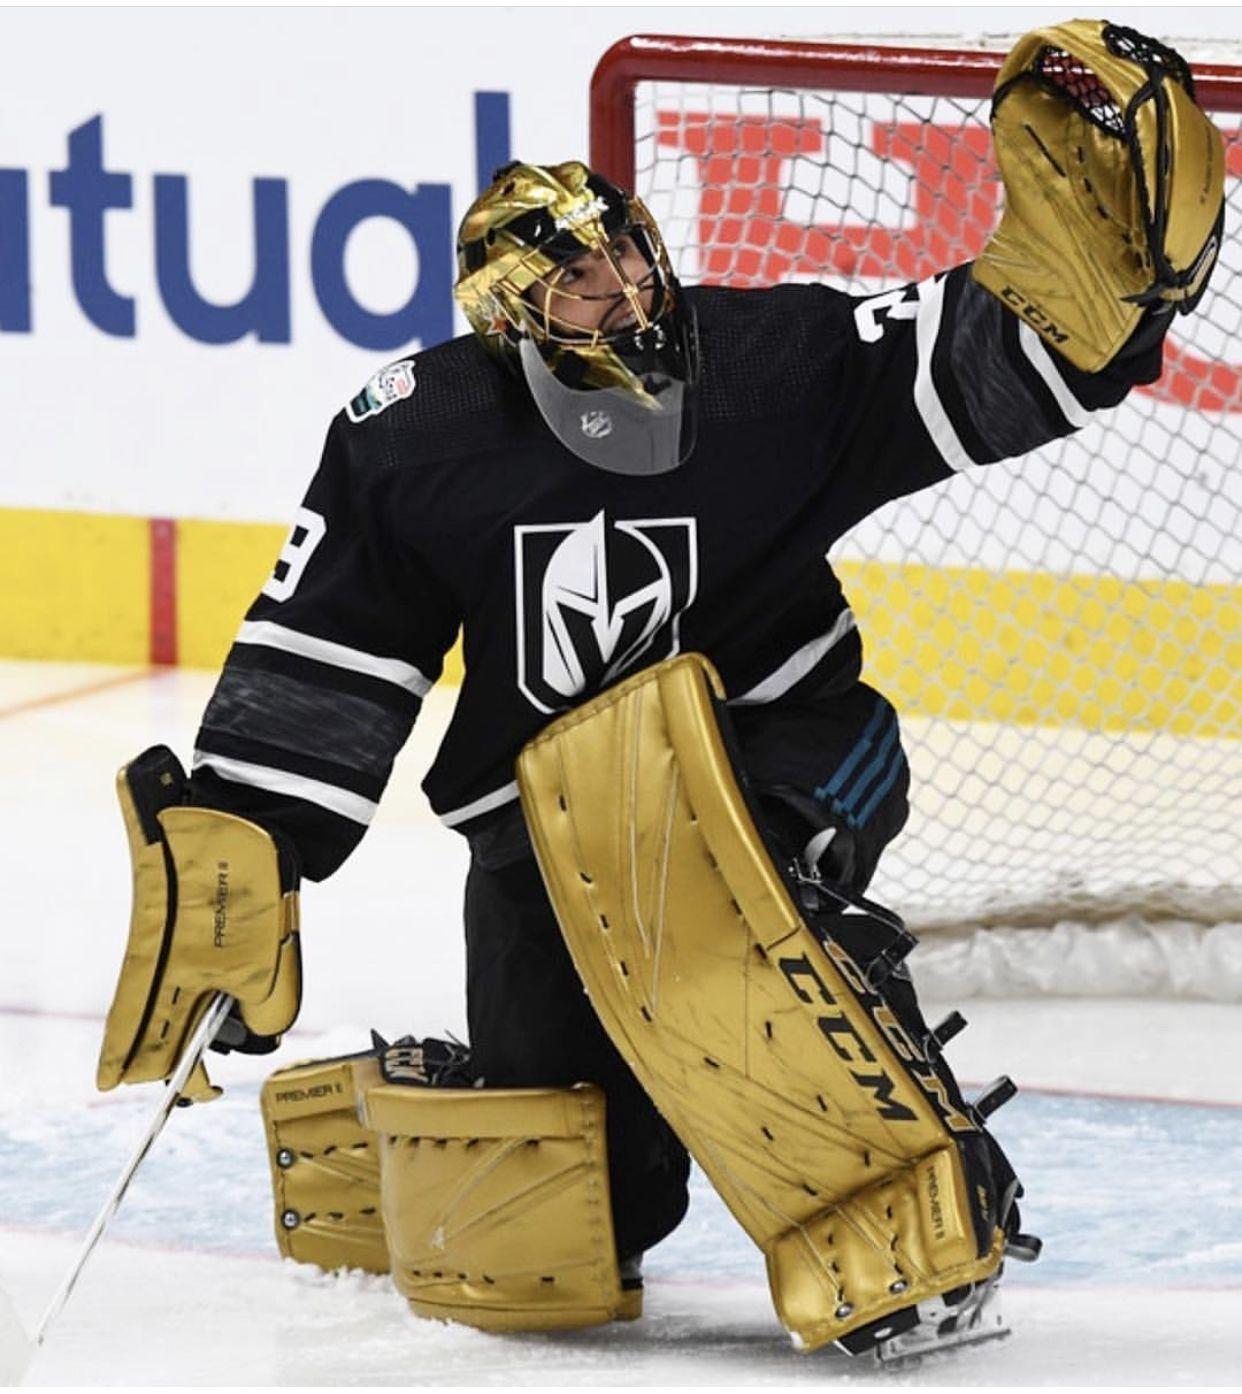 Pin By Scott Johnson On Hockey Hockey Goalie National Hockey League Goalie Pads